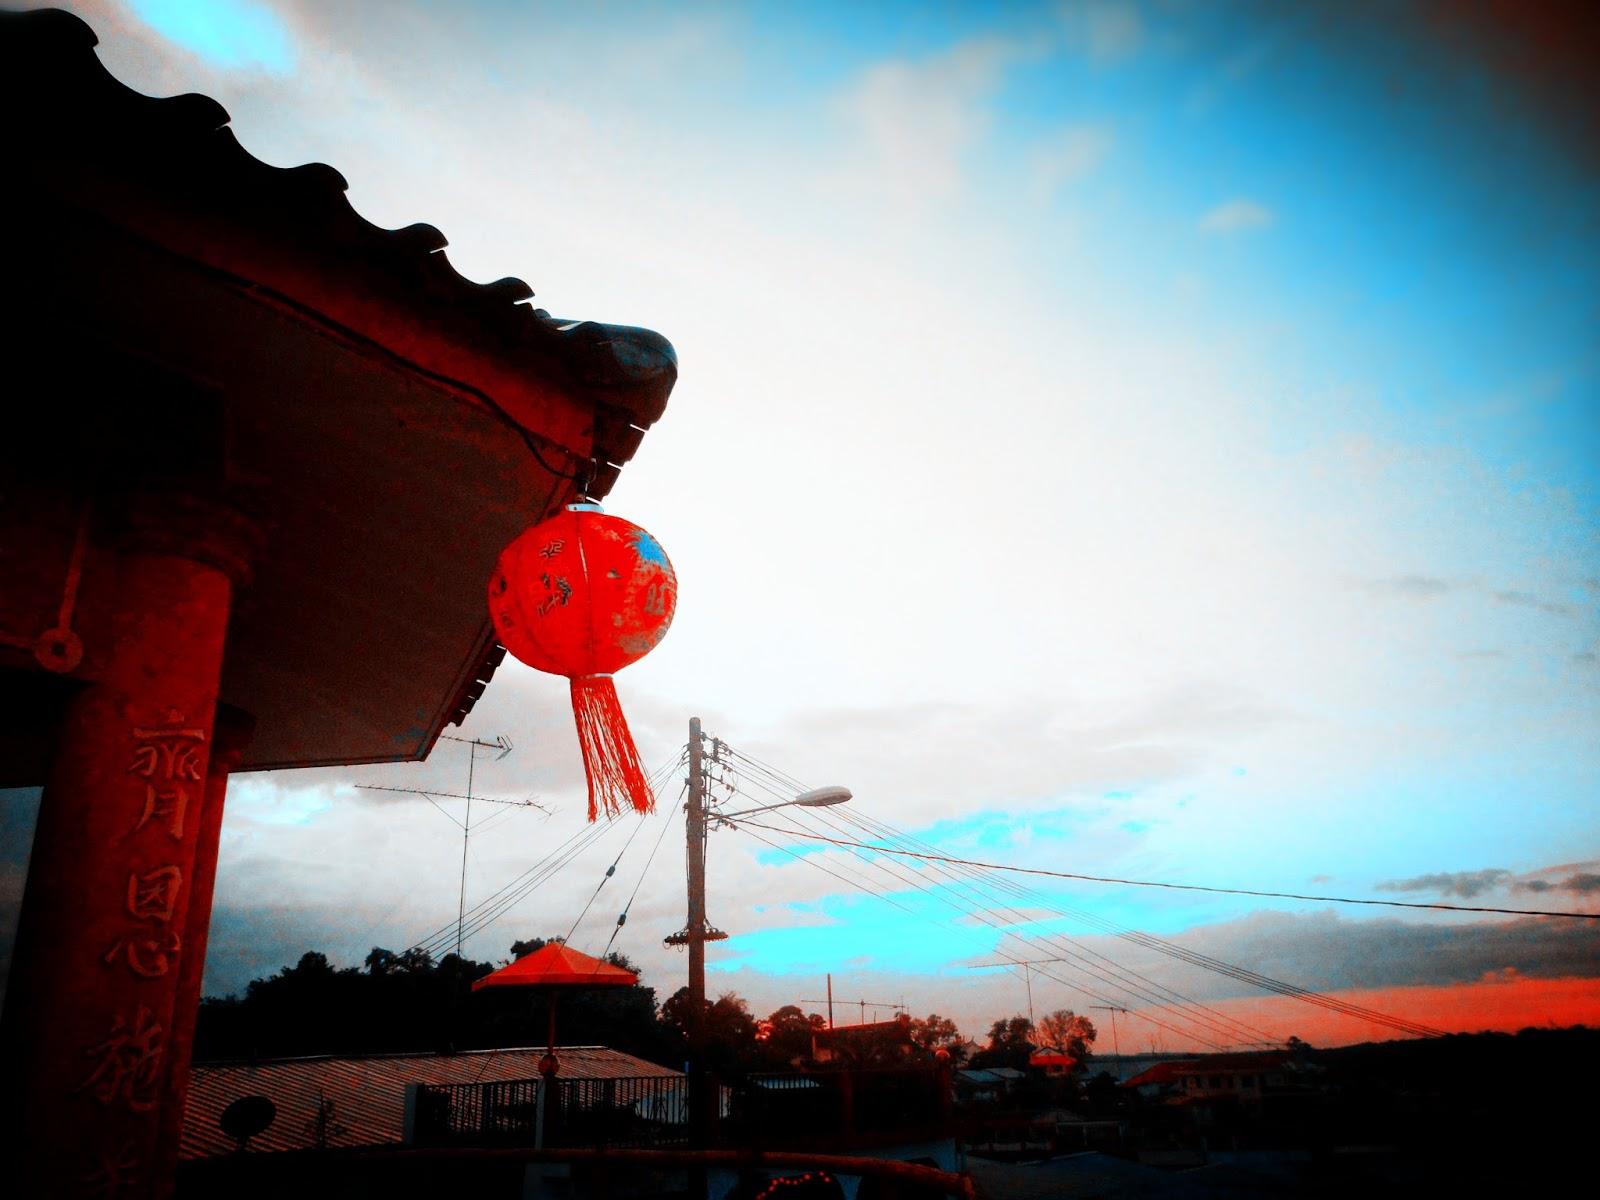 Kumpulan Foto Senja Yang Menawan